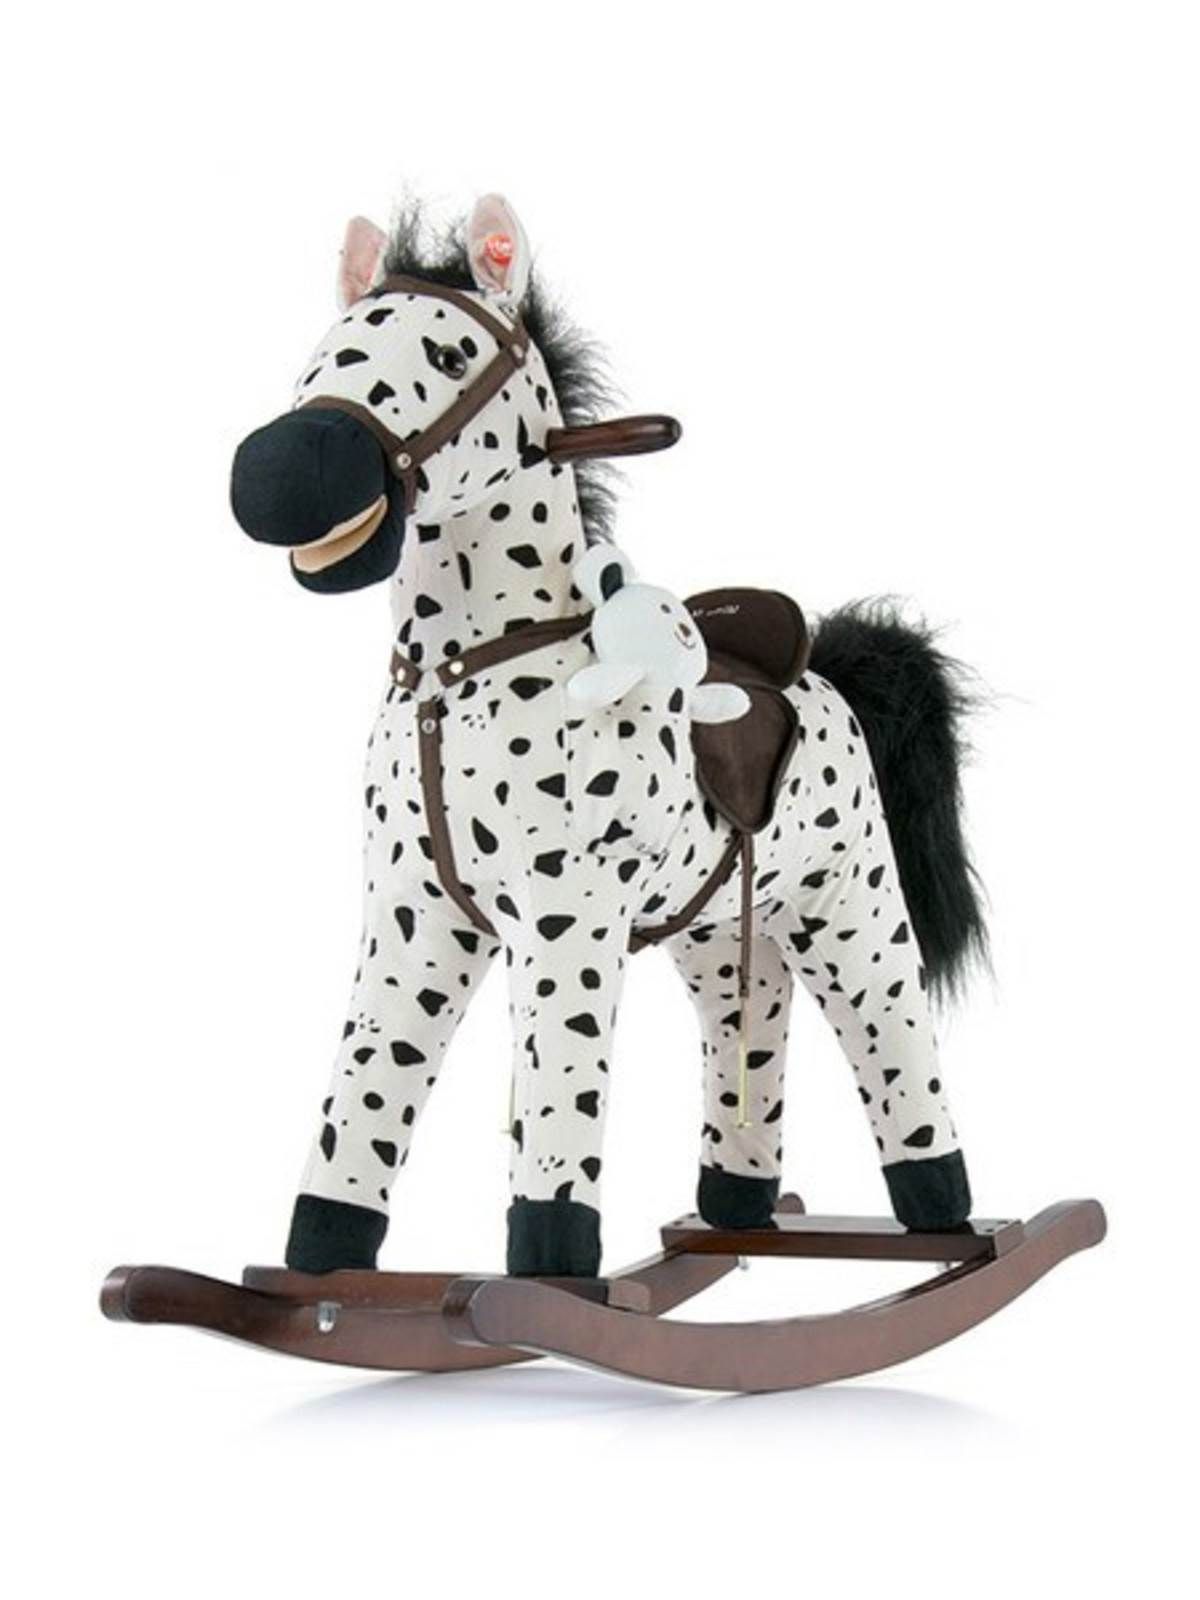 Houpací koník s melodií Milly Mally Mustang bílo-černý puntíkovaný - bílá